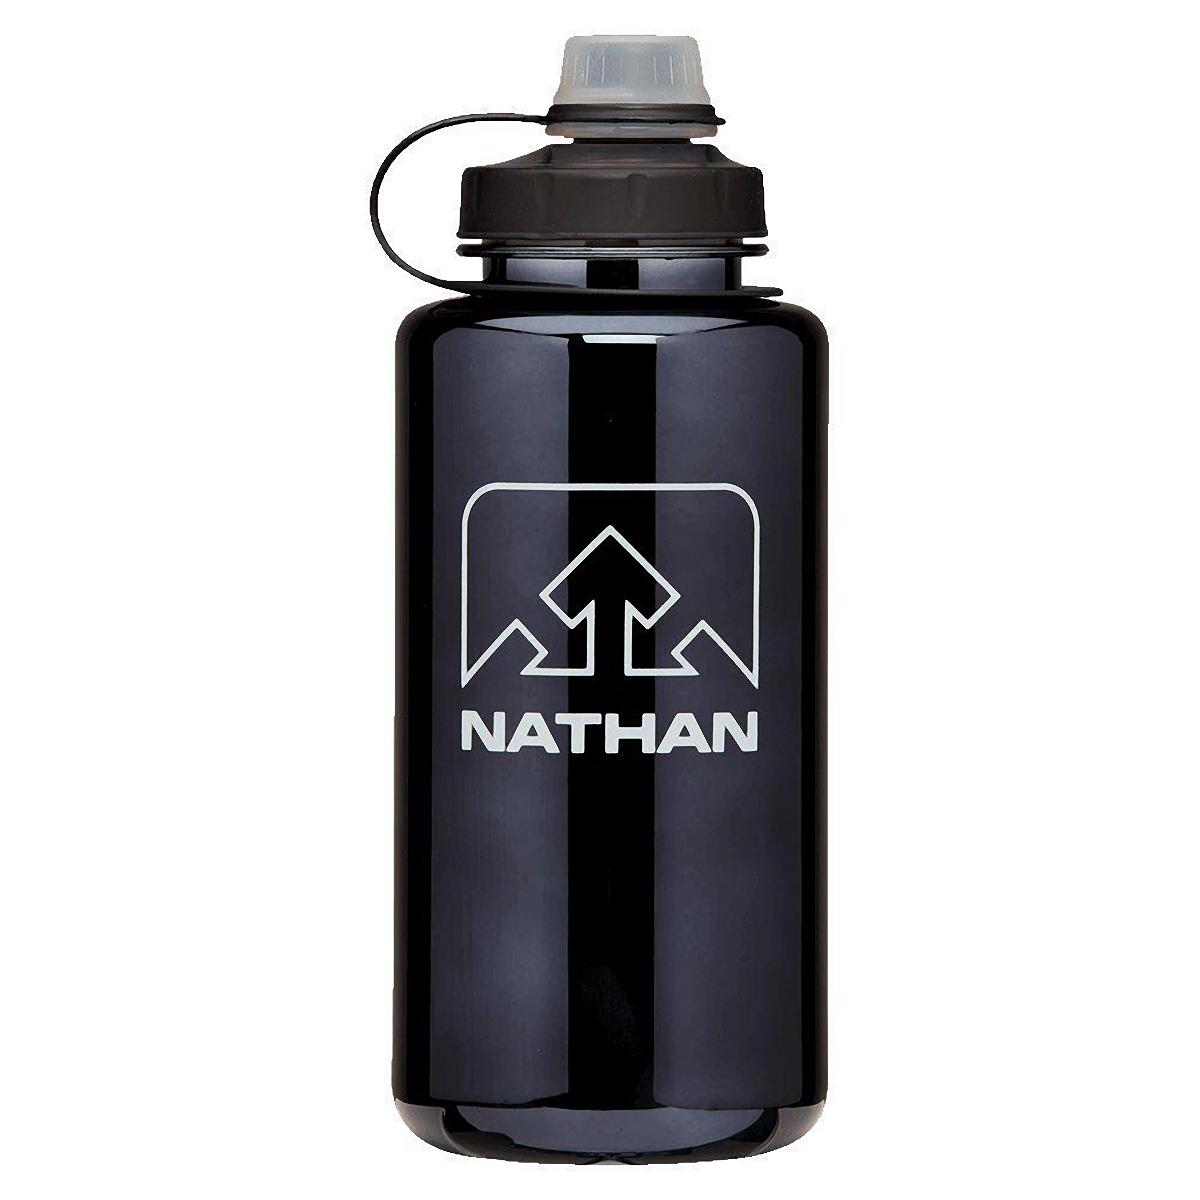 Nathan Bigshot 1 L Hydration Bottle - Color: Black/White - Size: One Size, Black/White, large, image 1